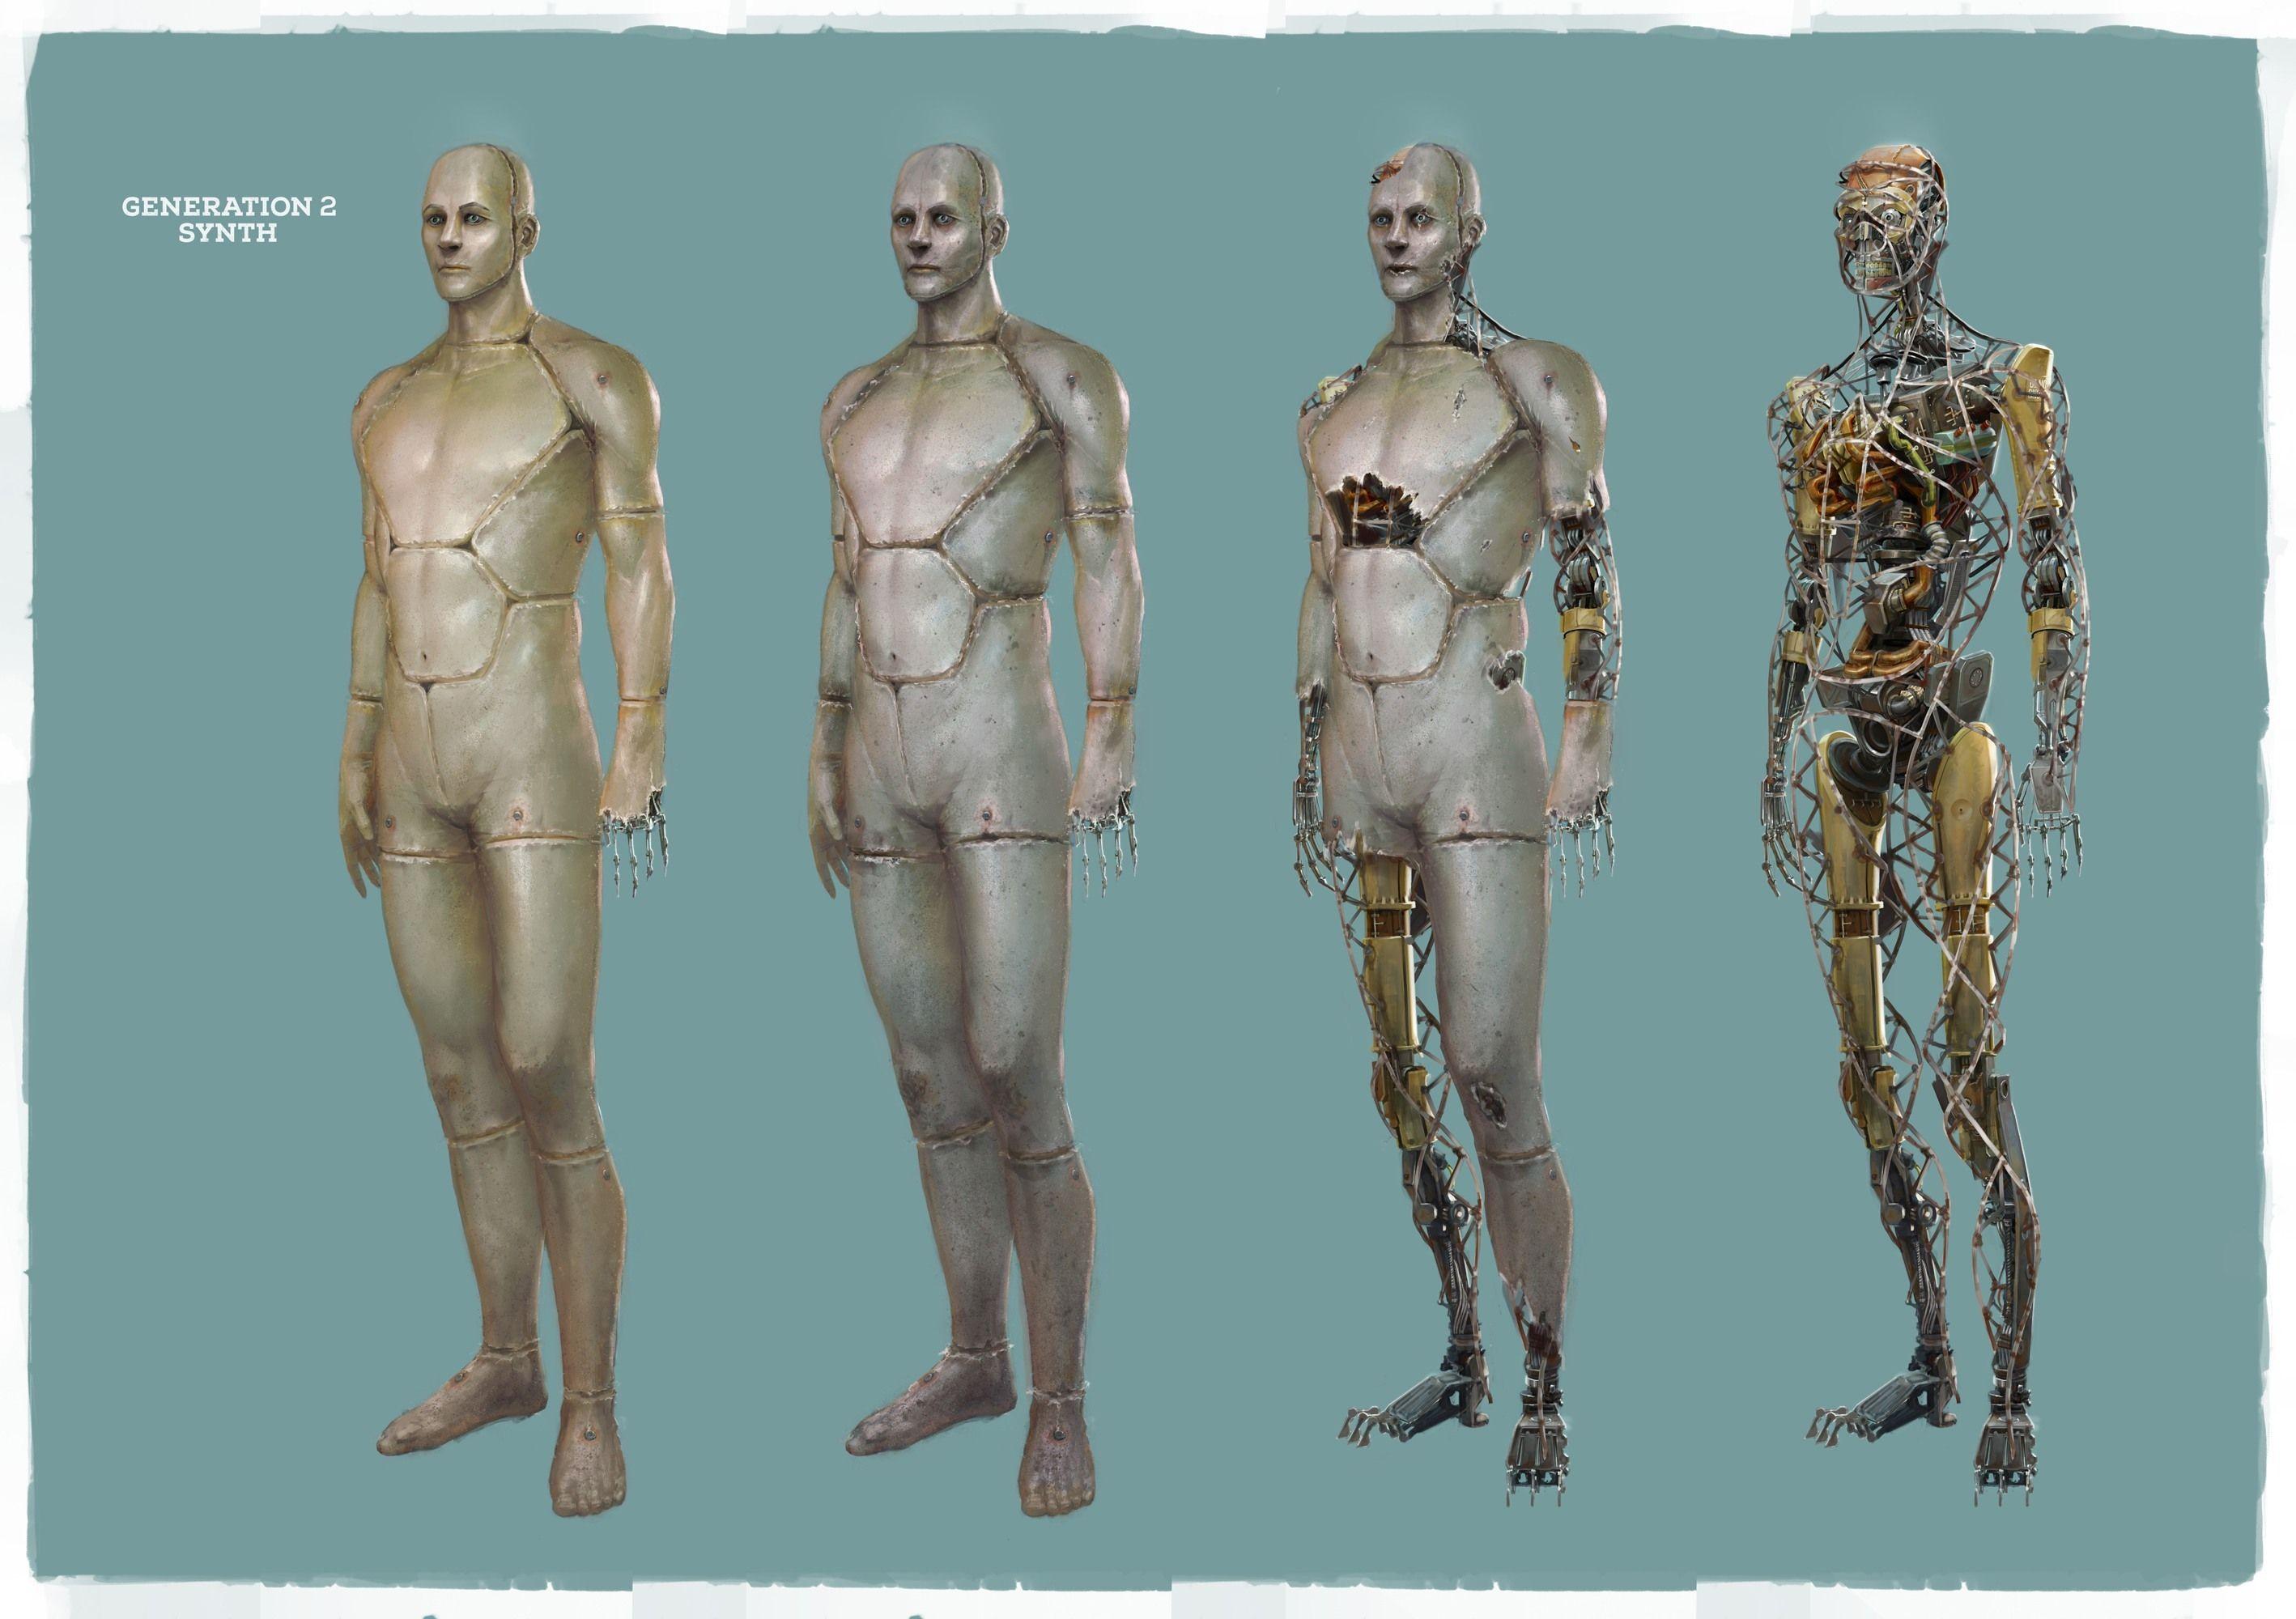 New Fallout  Concept Art Revealed Fallout Concept Art Fallout